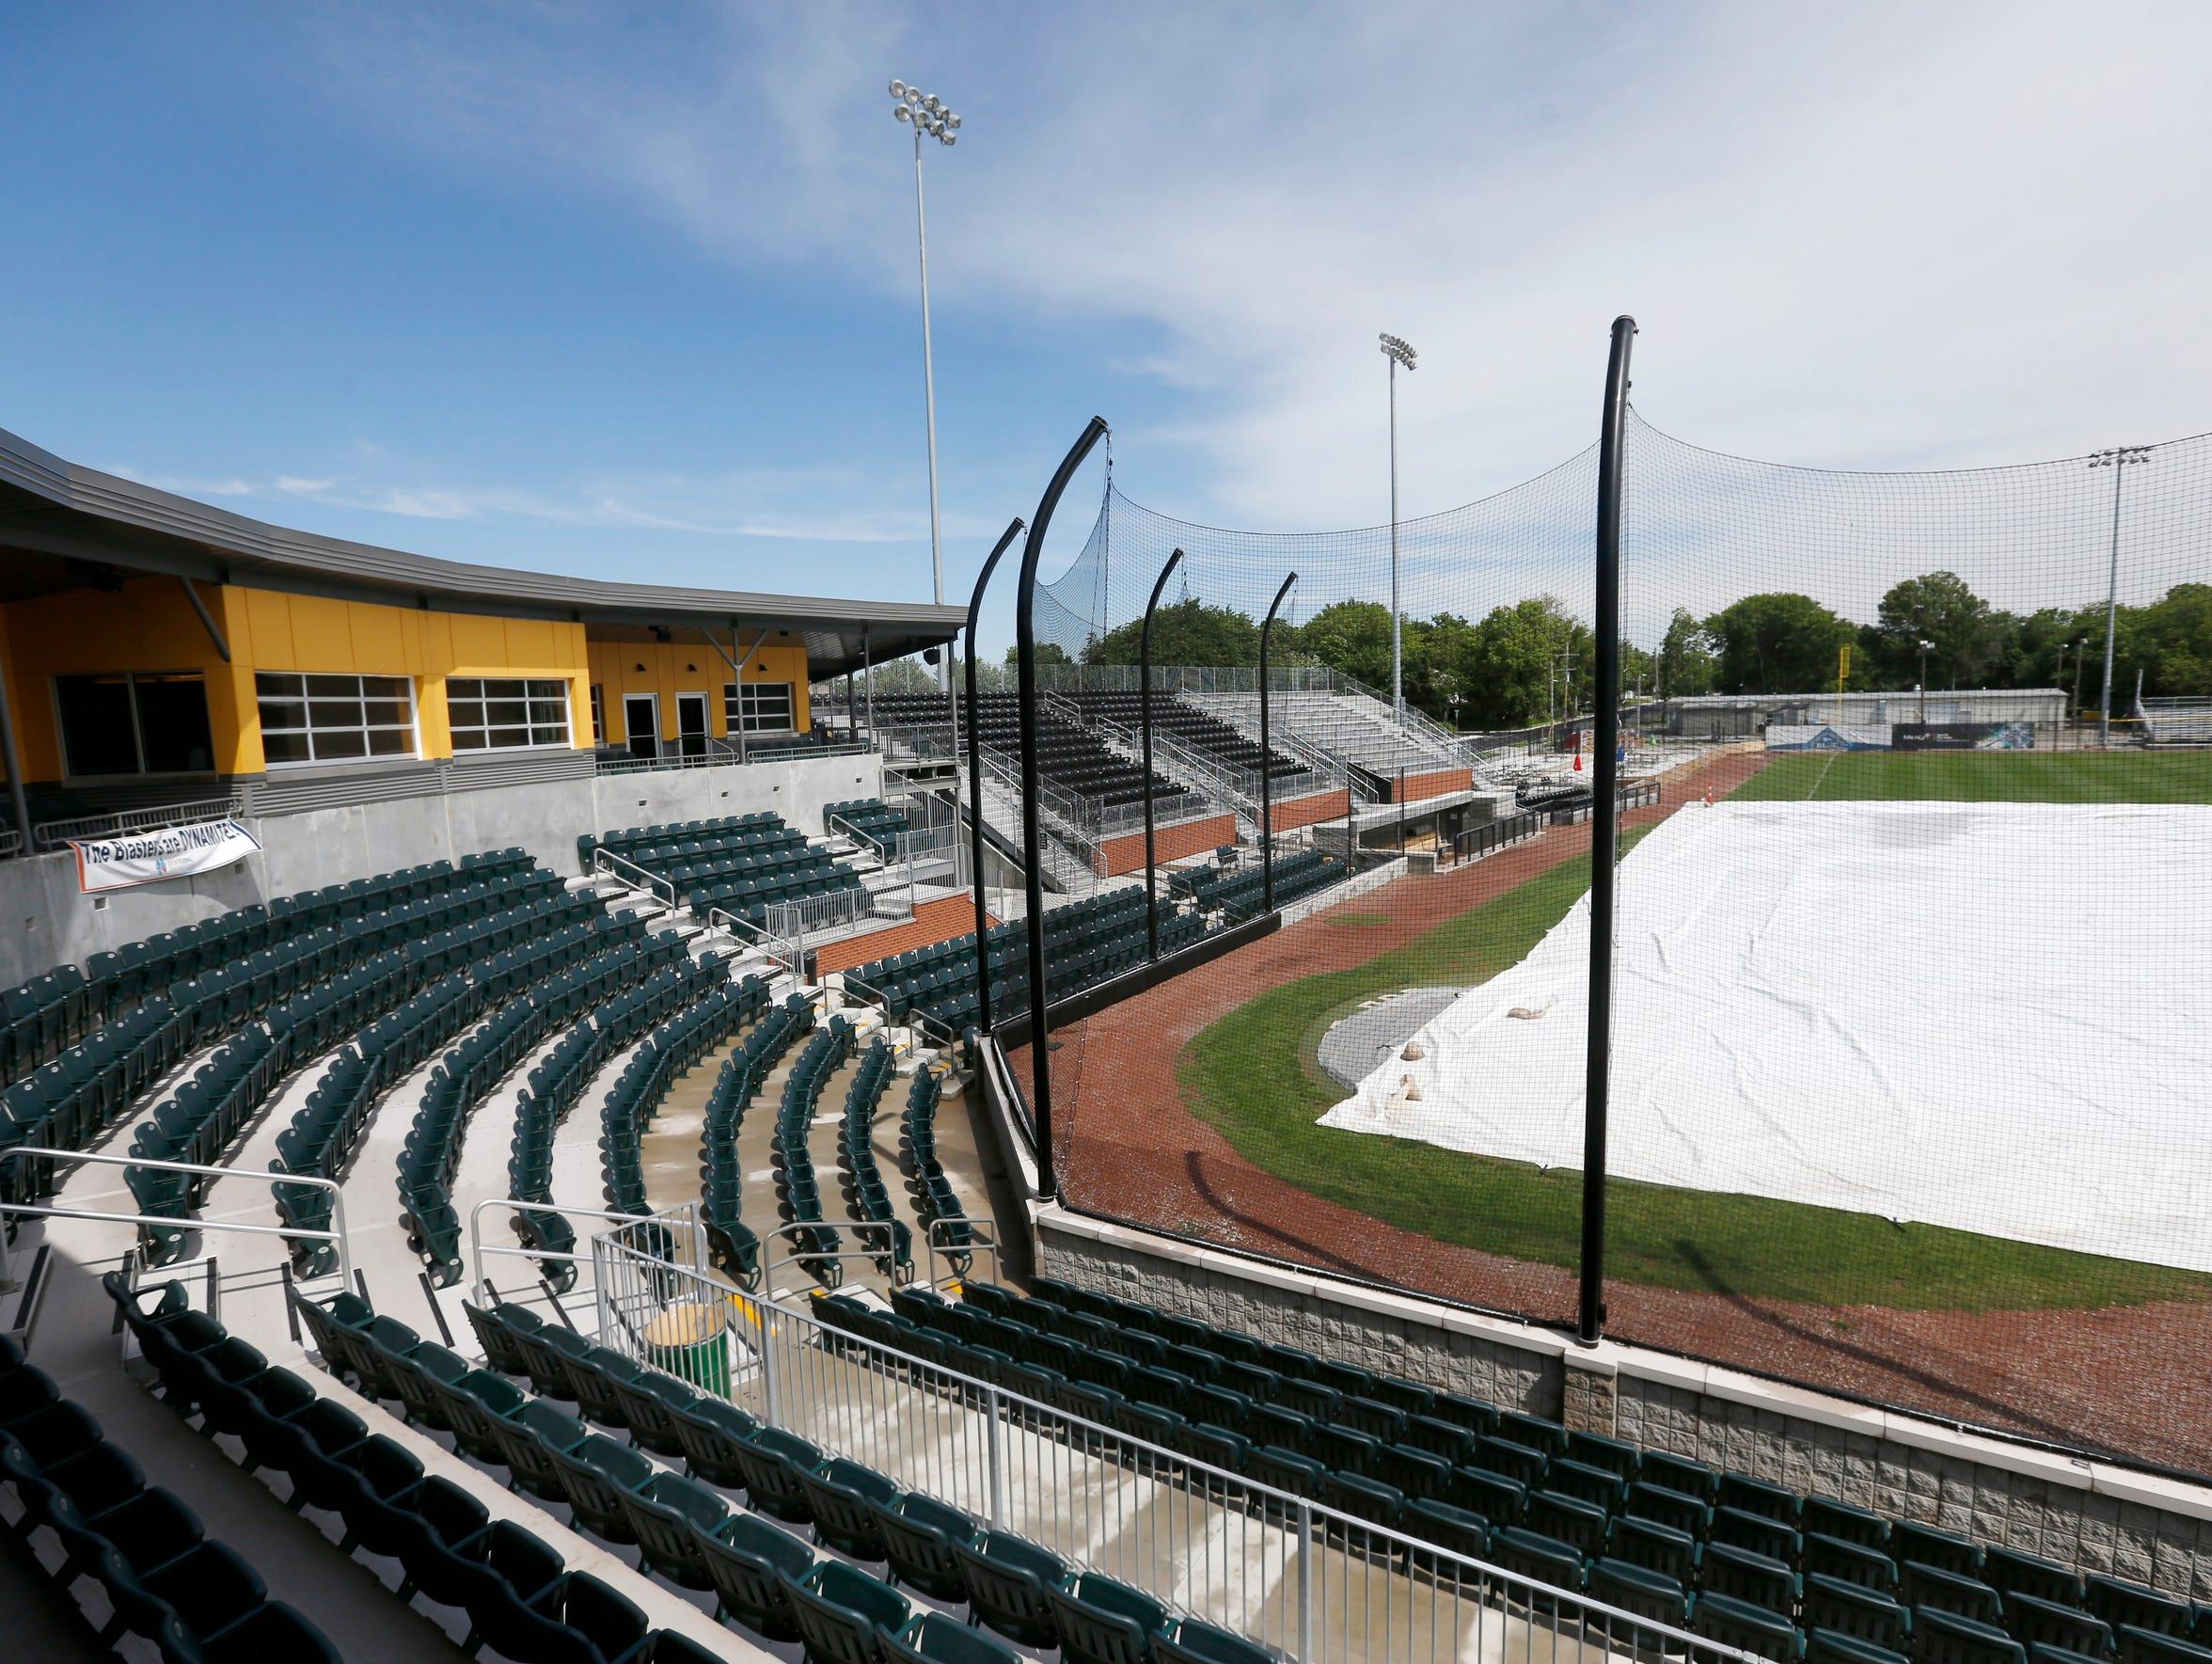 Joe Becker Stadium in Joplin, Mo.